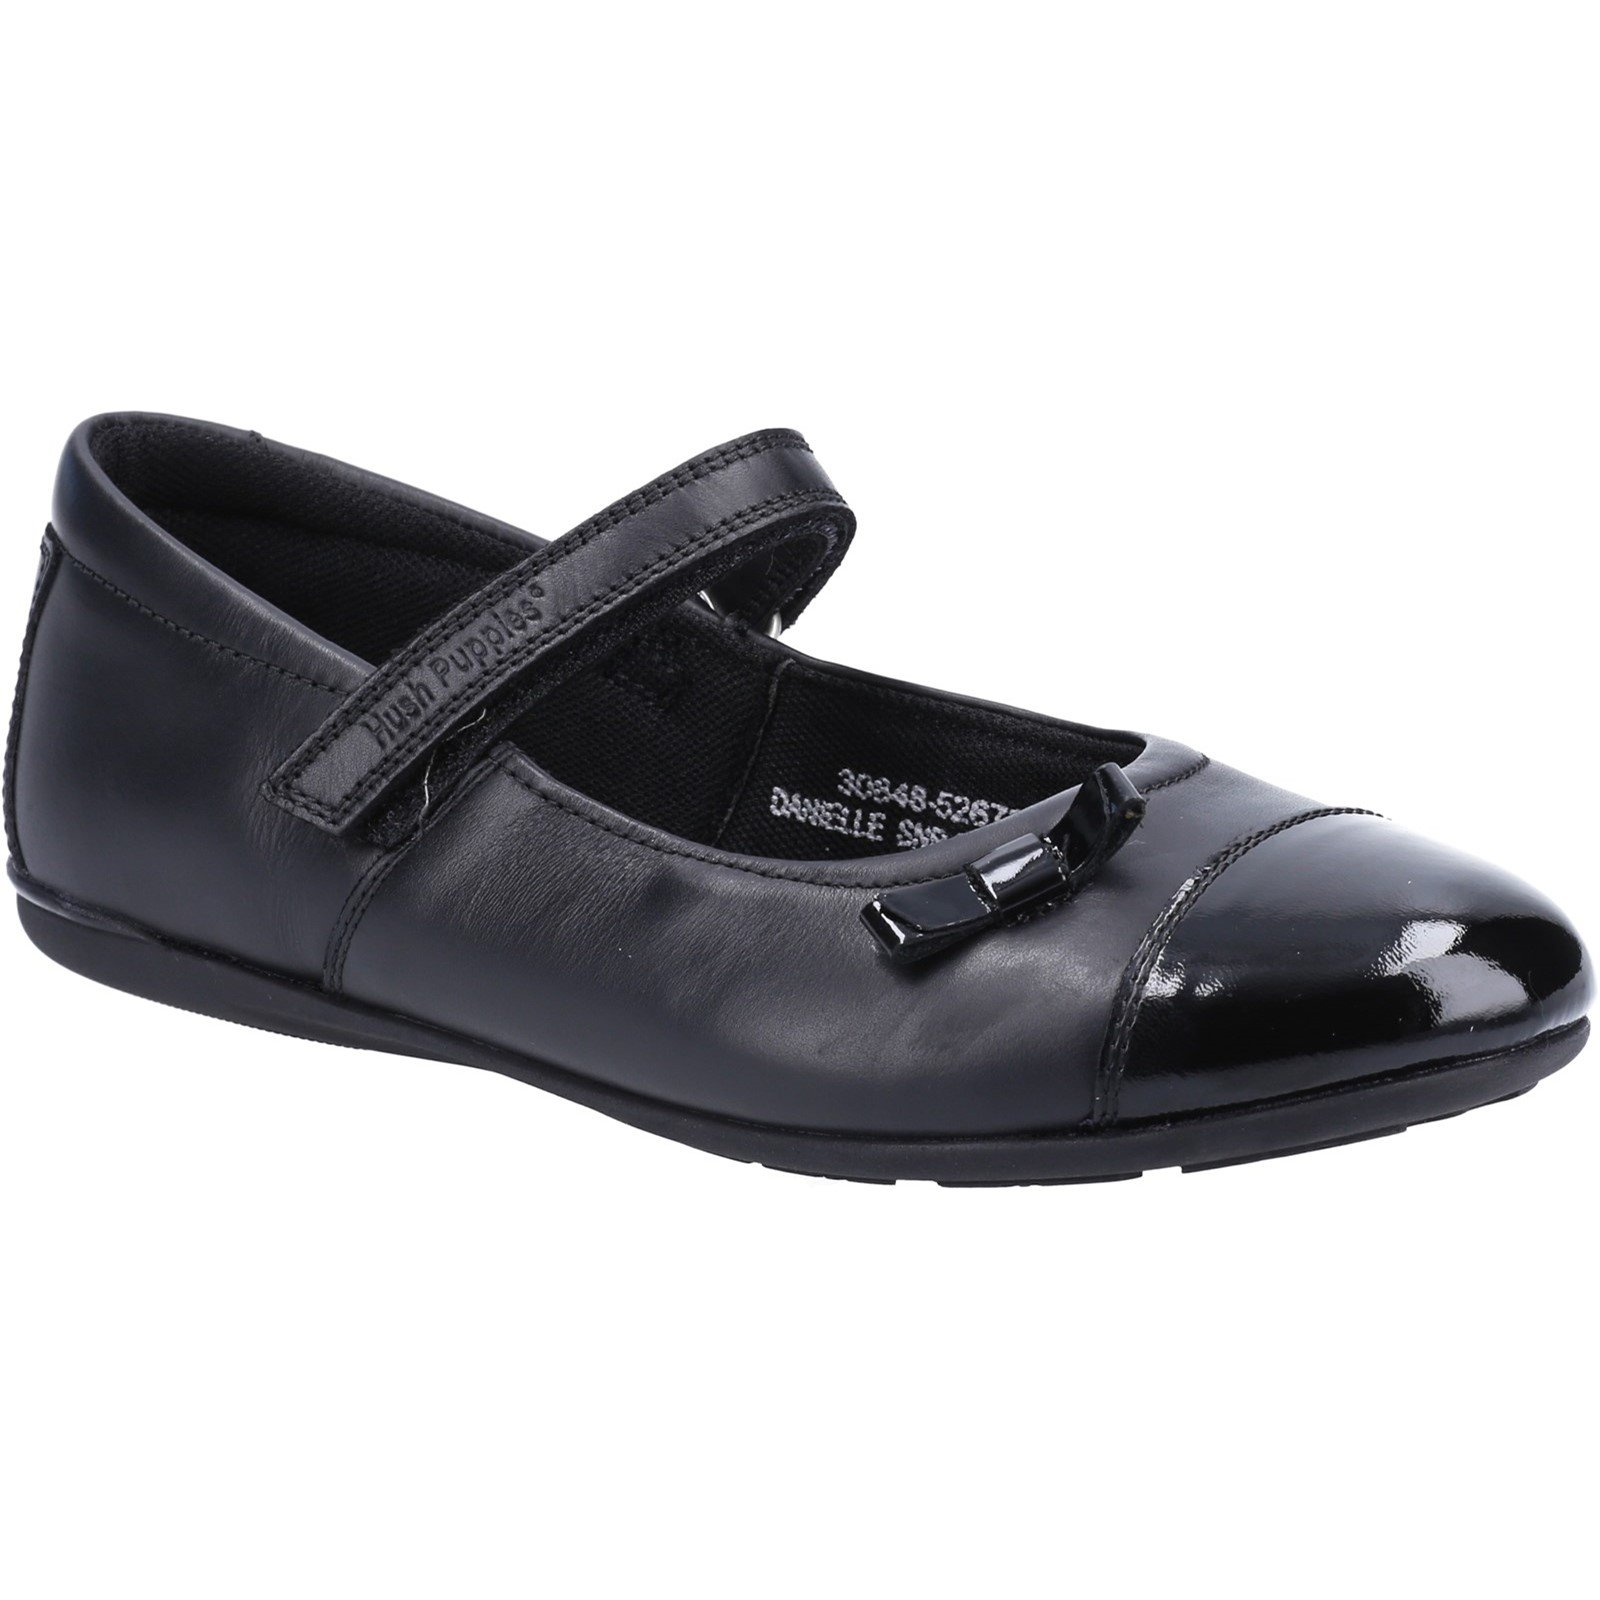 Hush Puppies Kid's Danielle Senior School Shoe Black 30848 - Black 4